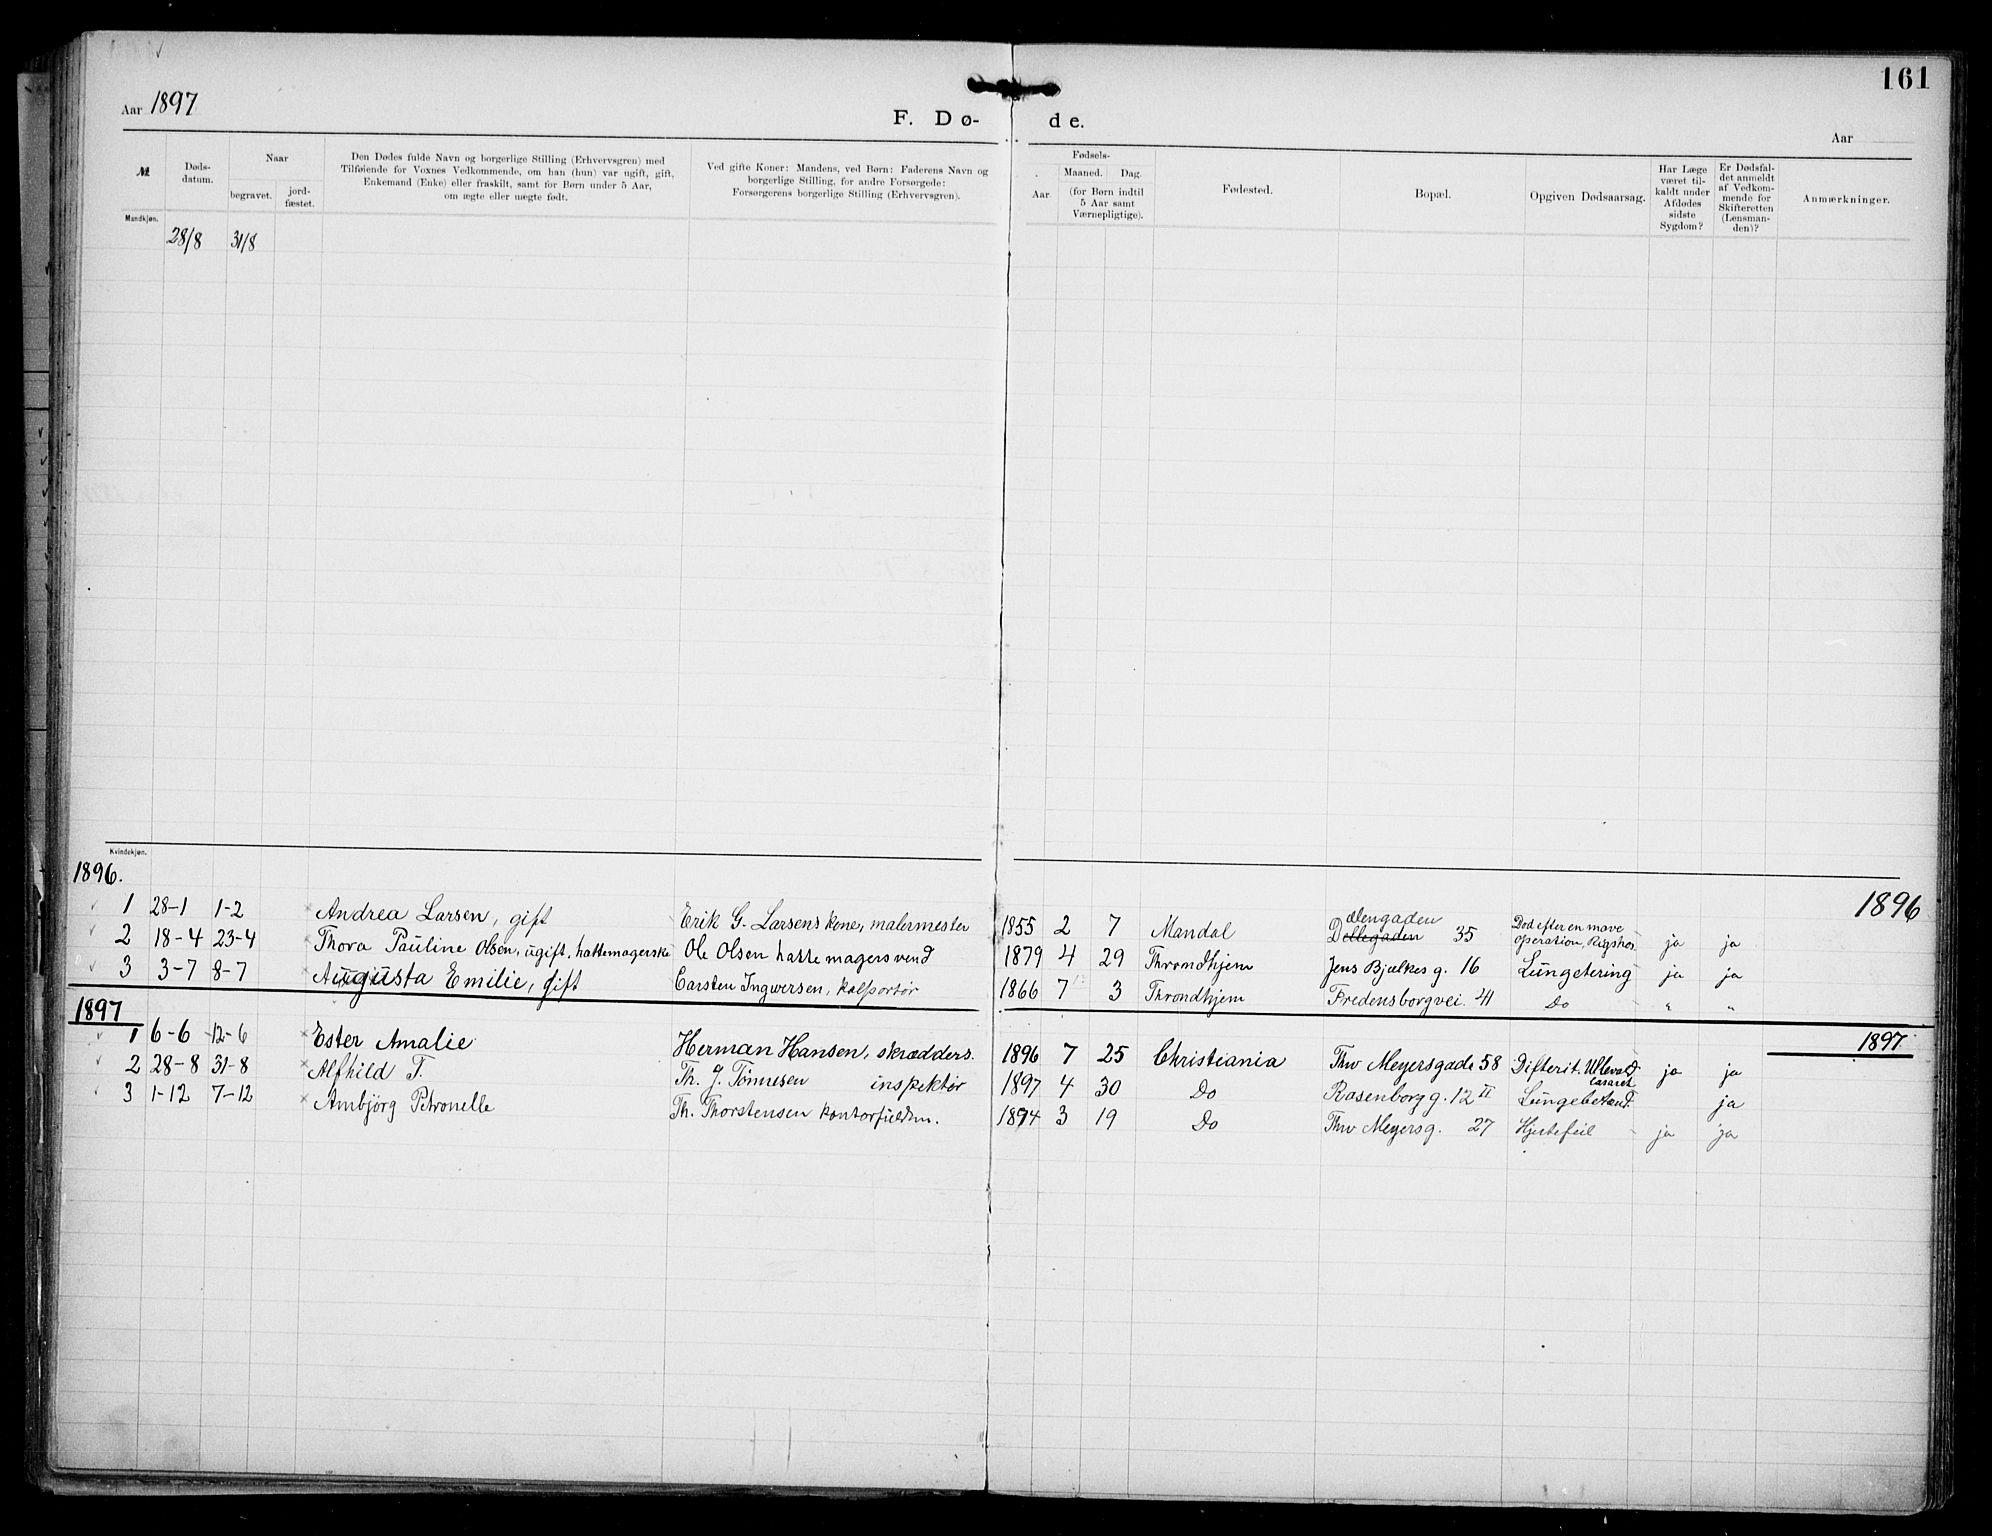 SAO, Den katolsk apostoliske menighet i Oslo , F/Fa/L0002: Dissenterprotokoll nr. 2, 1892-1937, s. 161